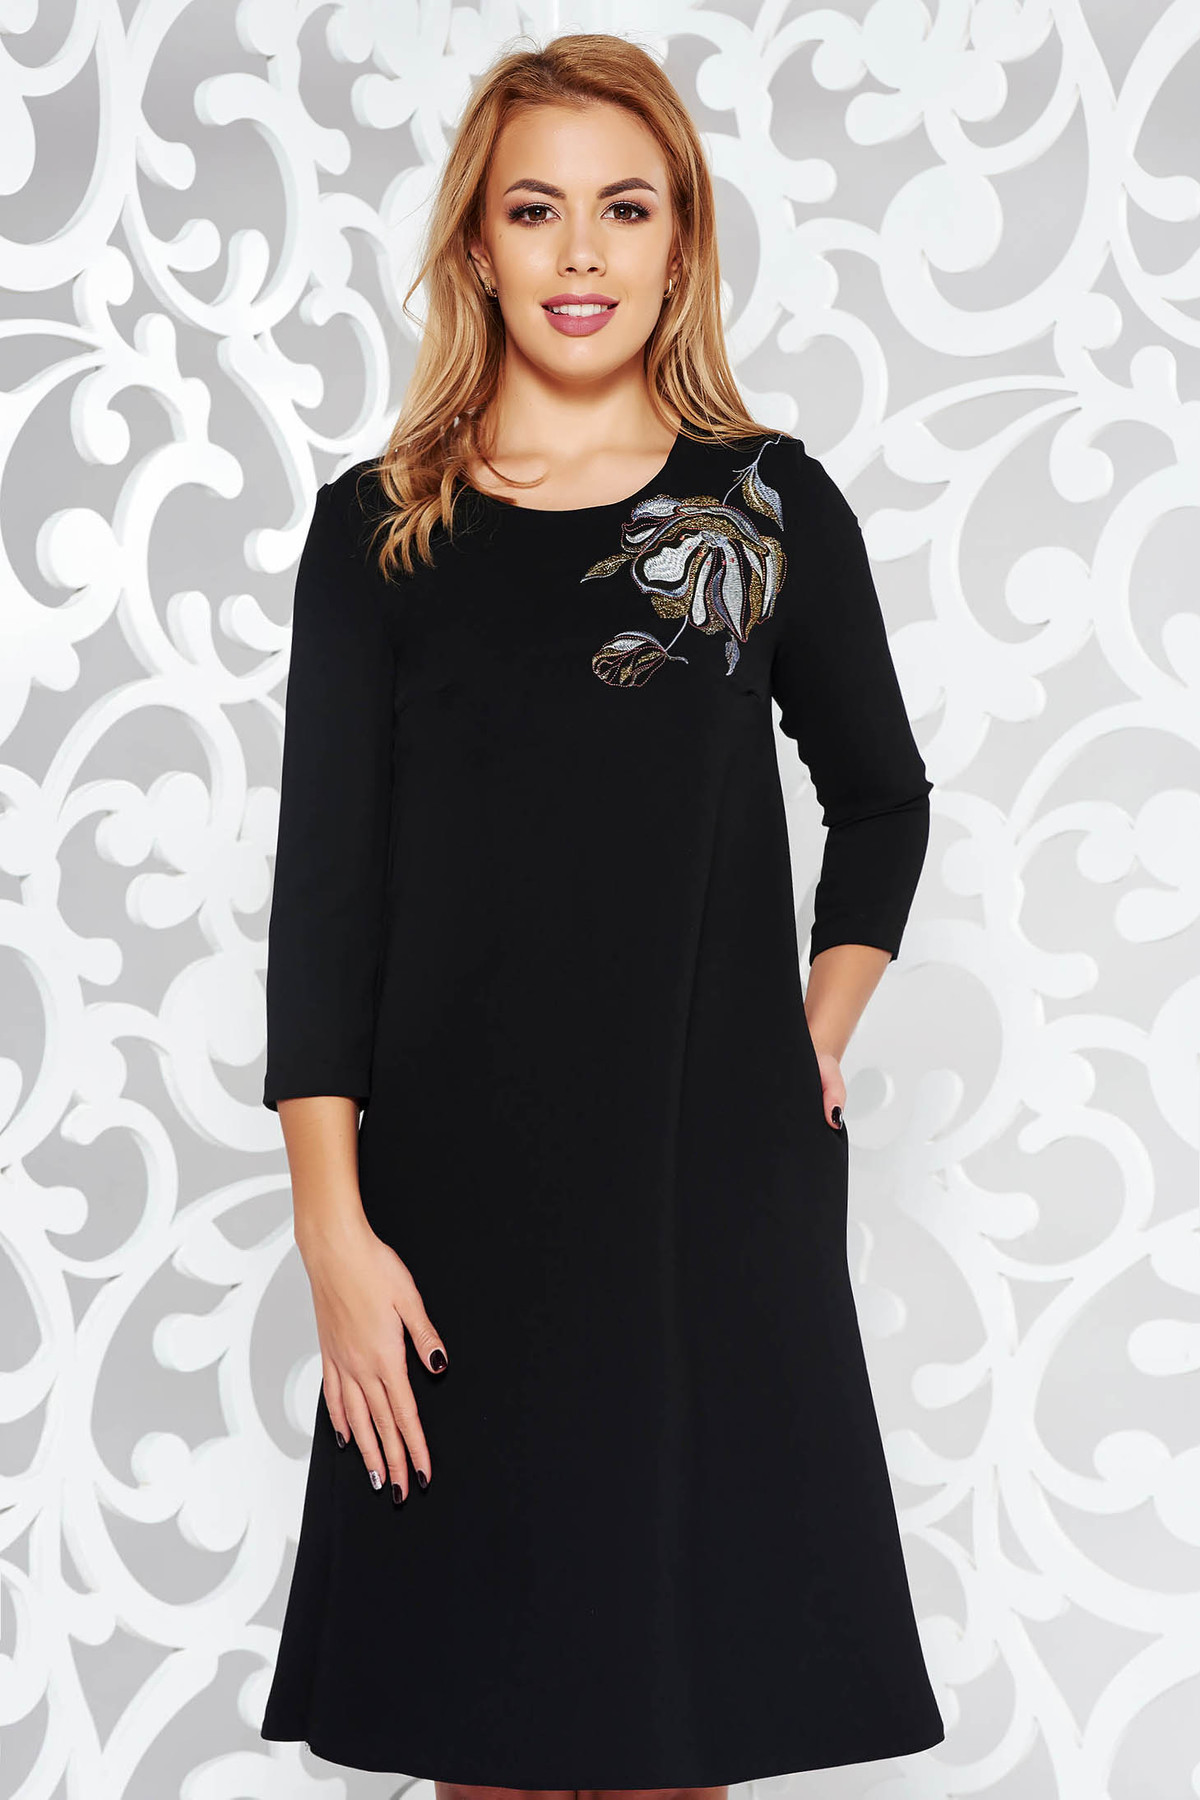 Rochie StarShinerS neagra eleganta cu croi larg brodata din stofa usor elastica captusita pe interior cu buzunare